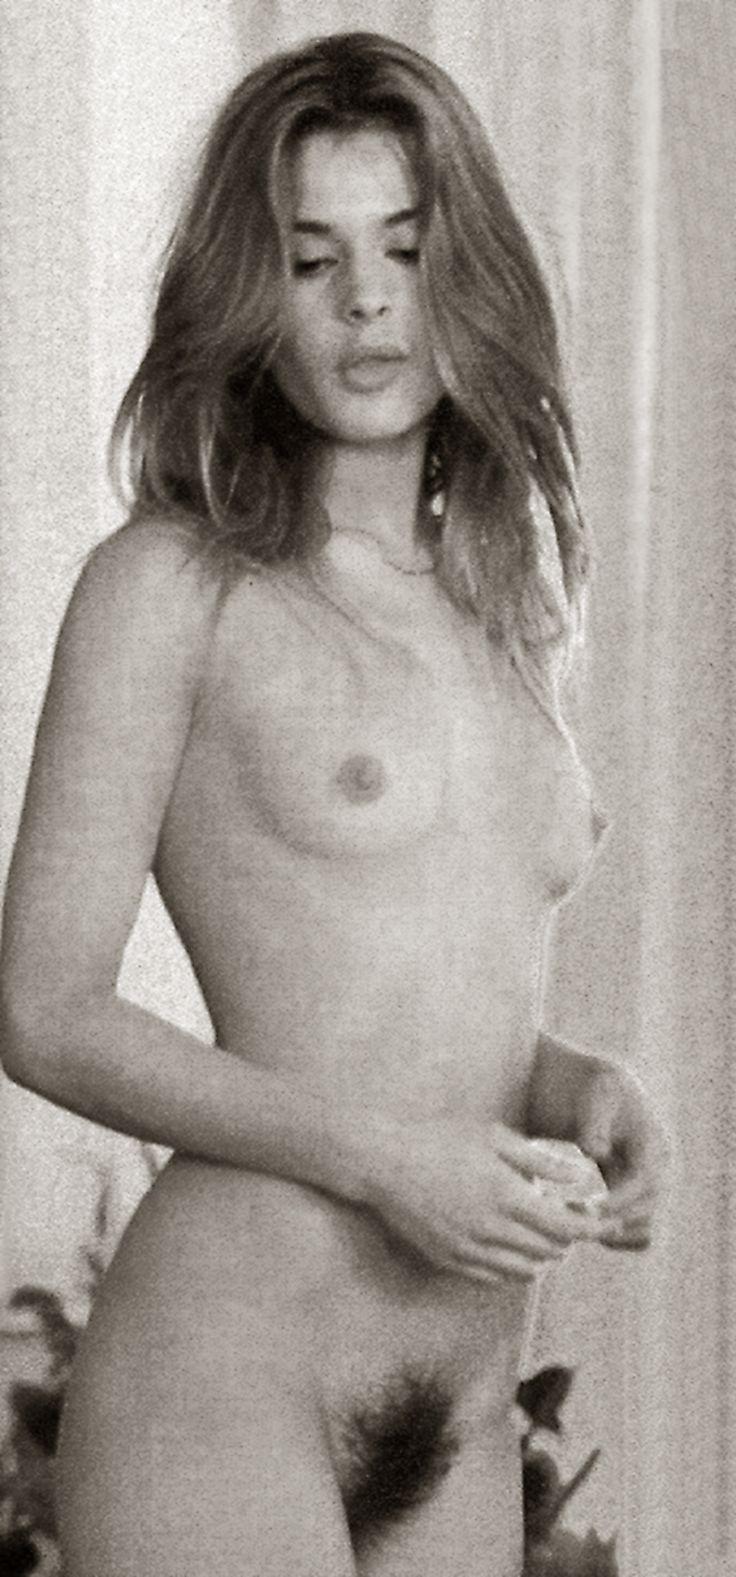 352 nudes